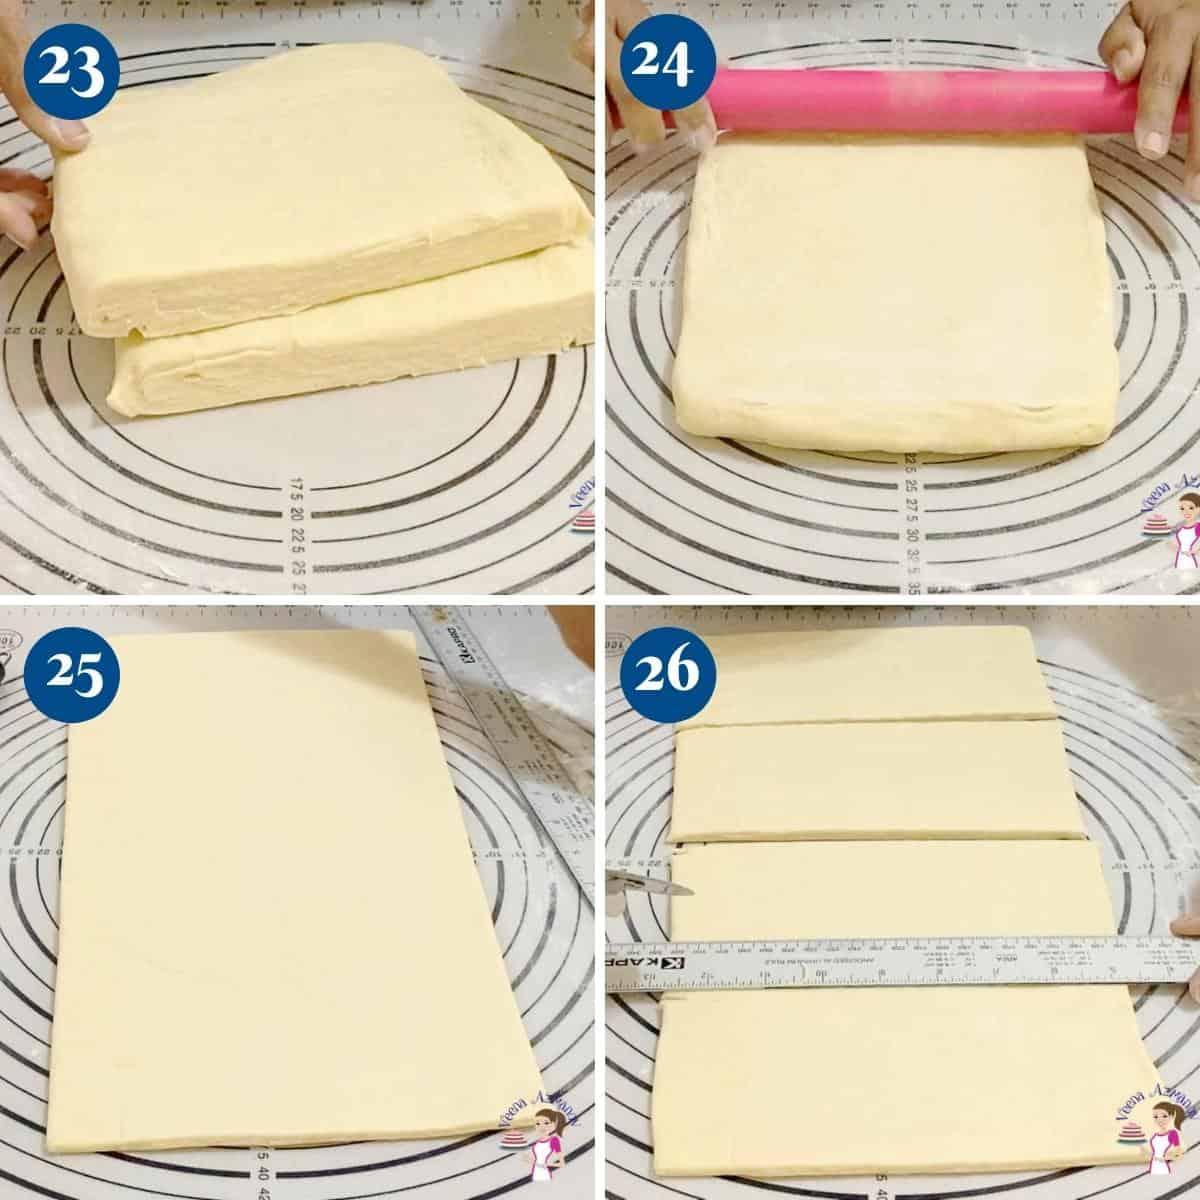 Progress pictures collage cutting the croissants dough.